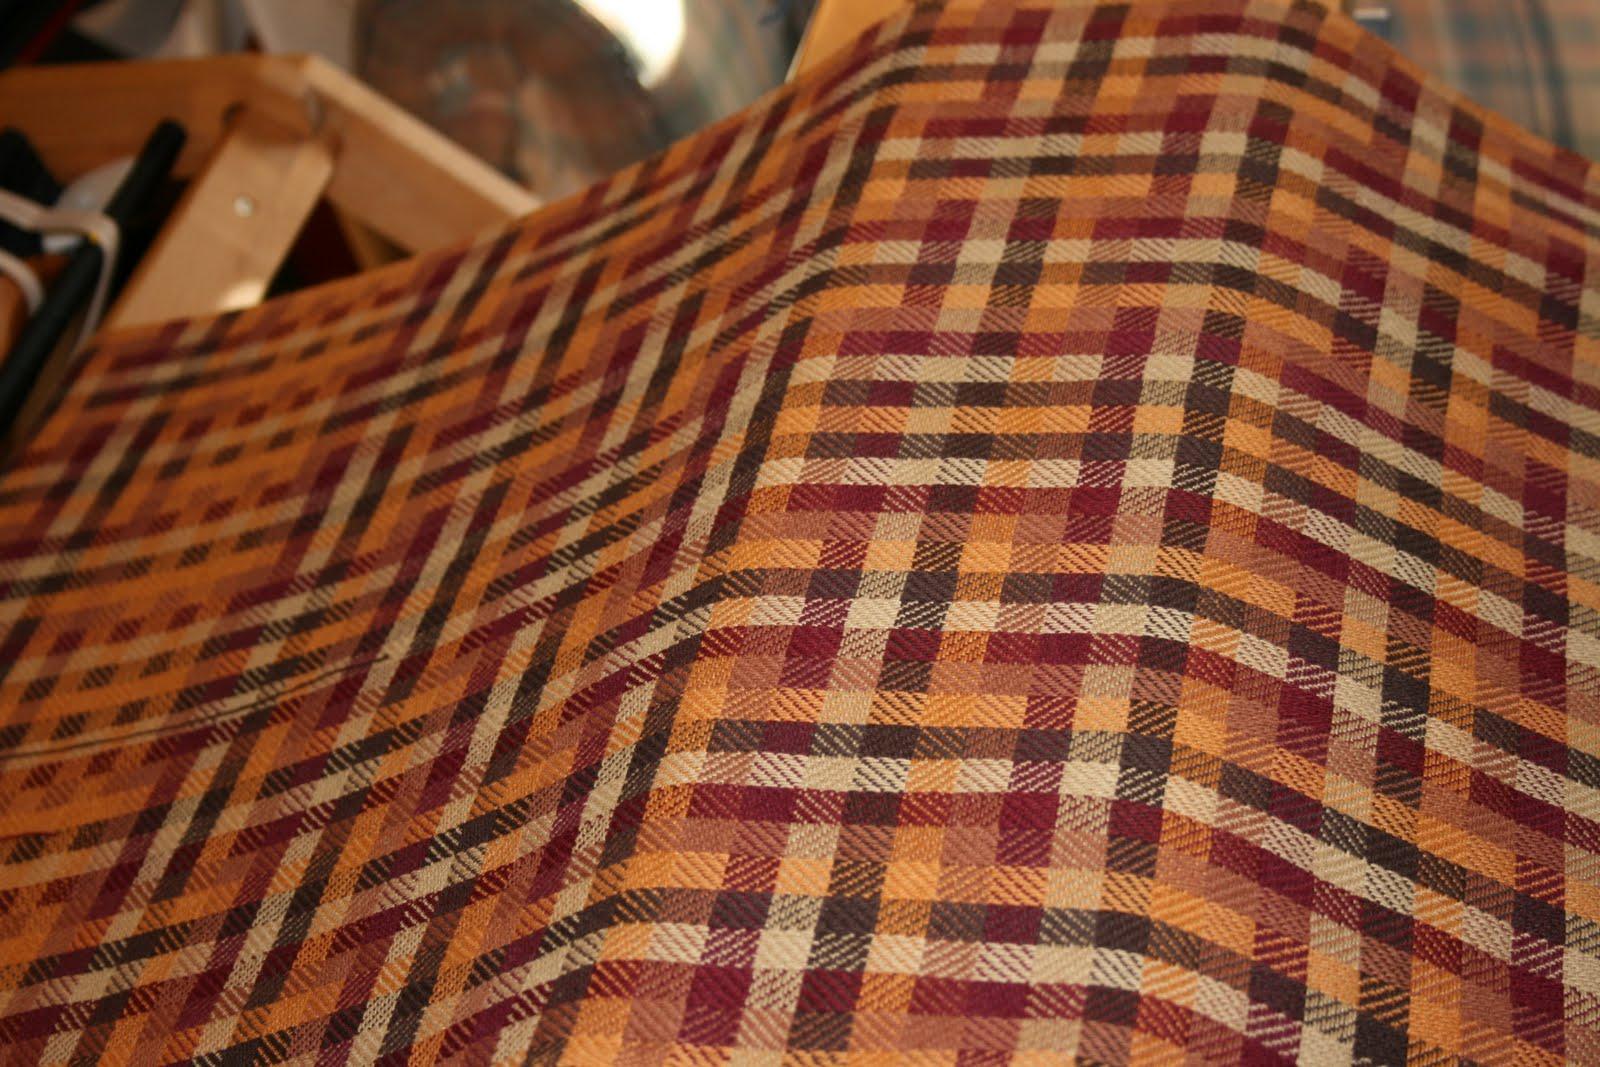 Rigid Heddle Loom Diagram Lewis Dot For Ph3 4 Harness Patterns Weaving Elsavadorla